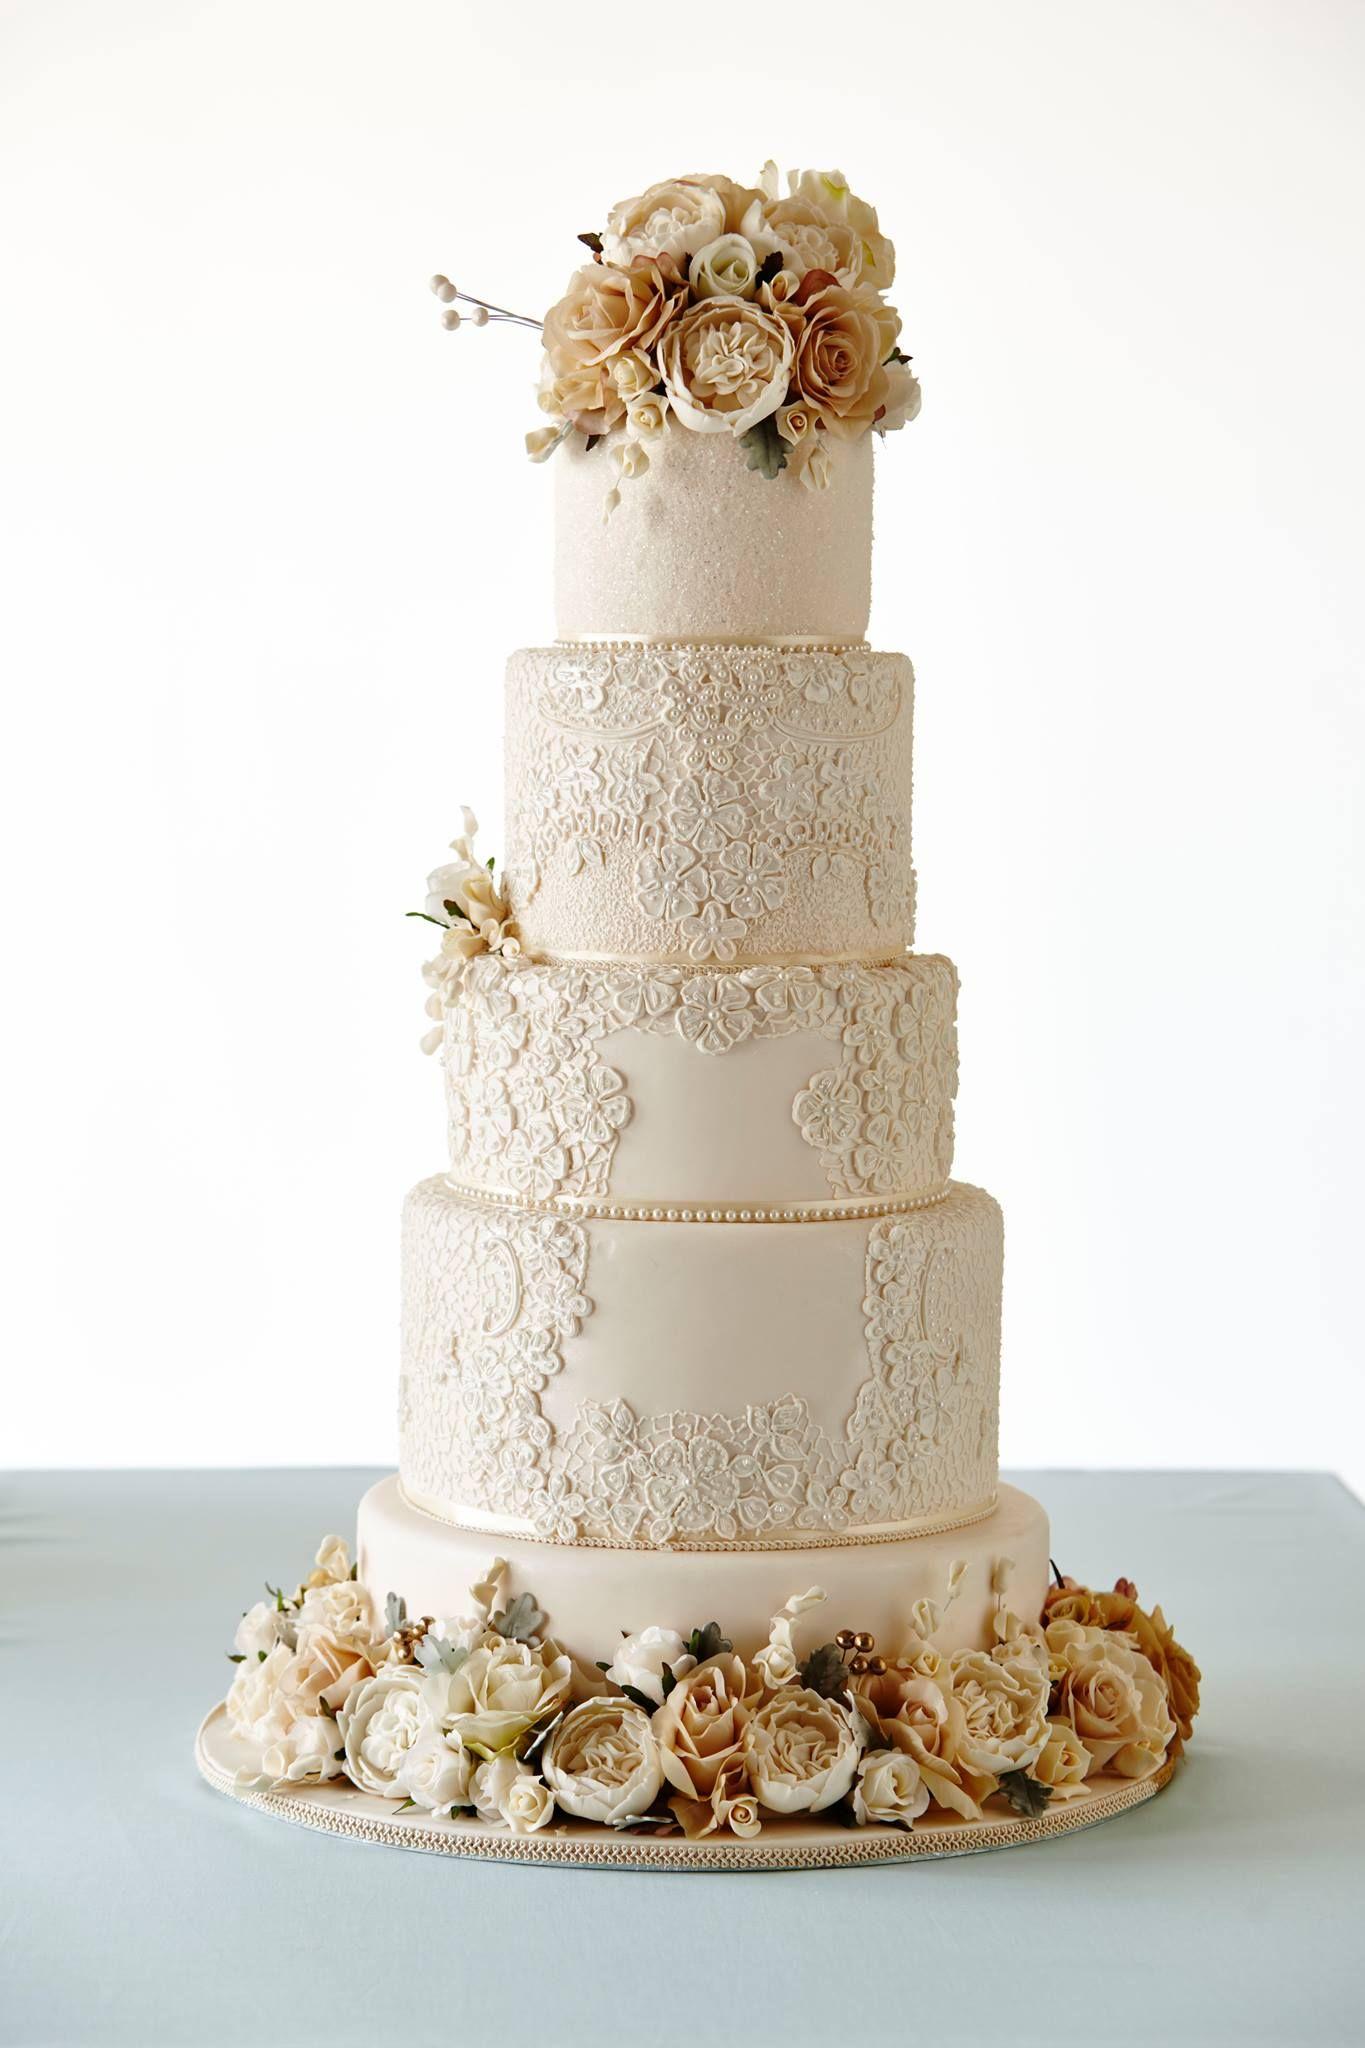 Best Wedding Cake Designers In Australia In 2020 Wedding Cake Strain Modern Wedding Cake Winter Wedding Cake